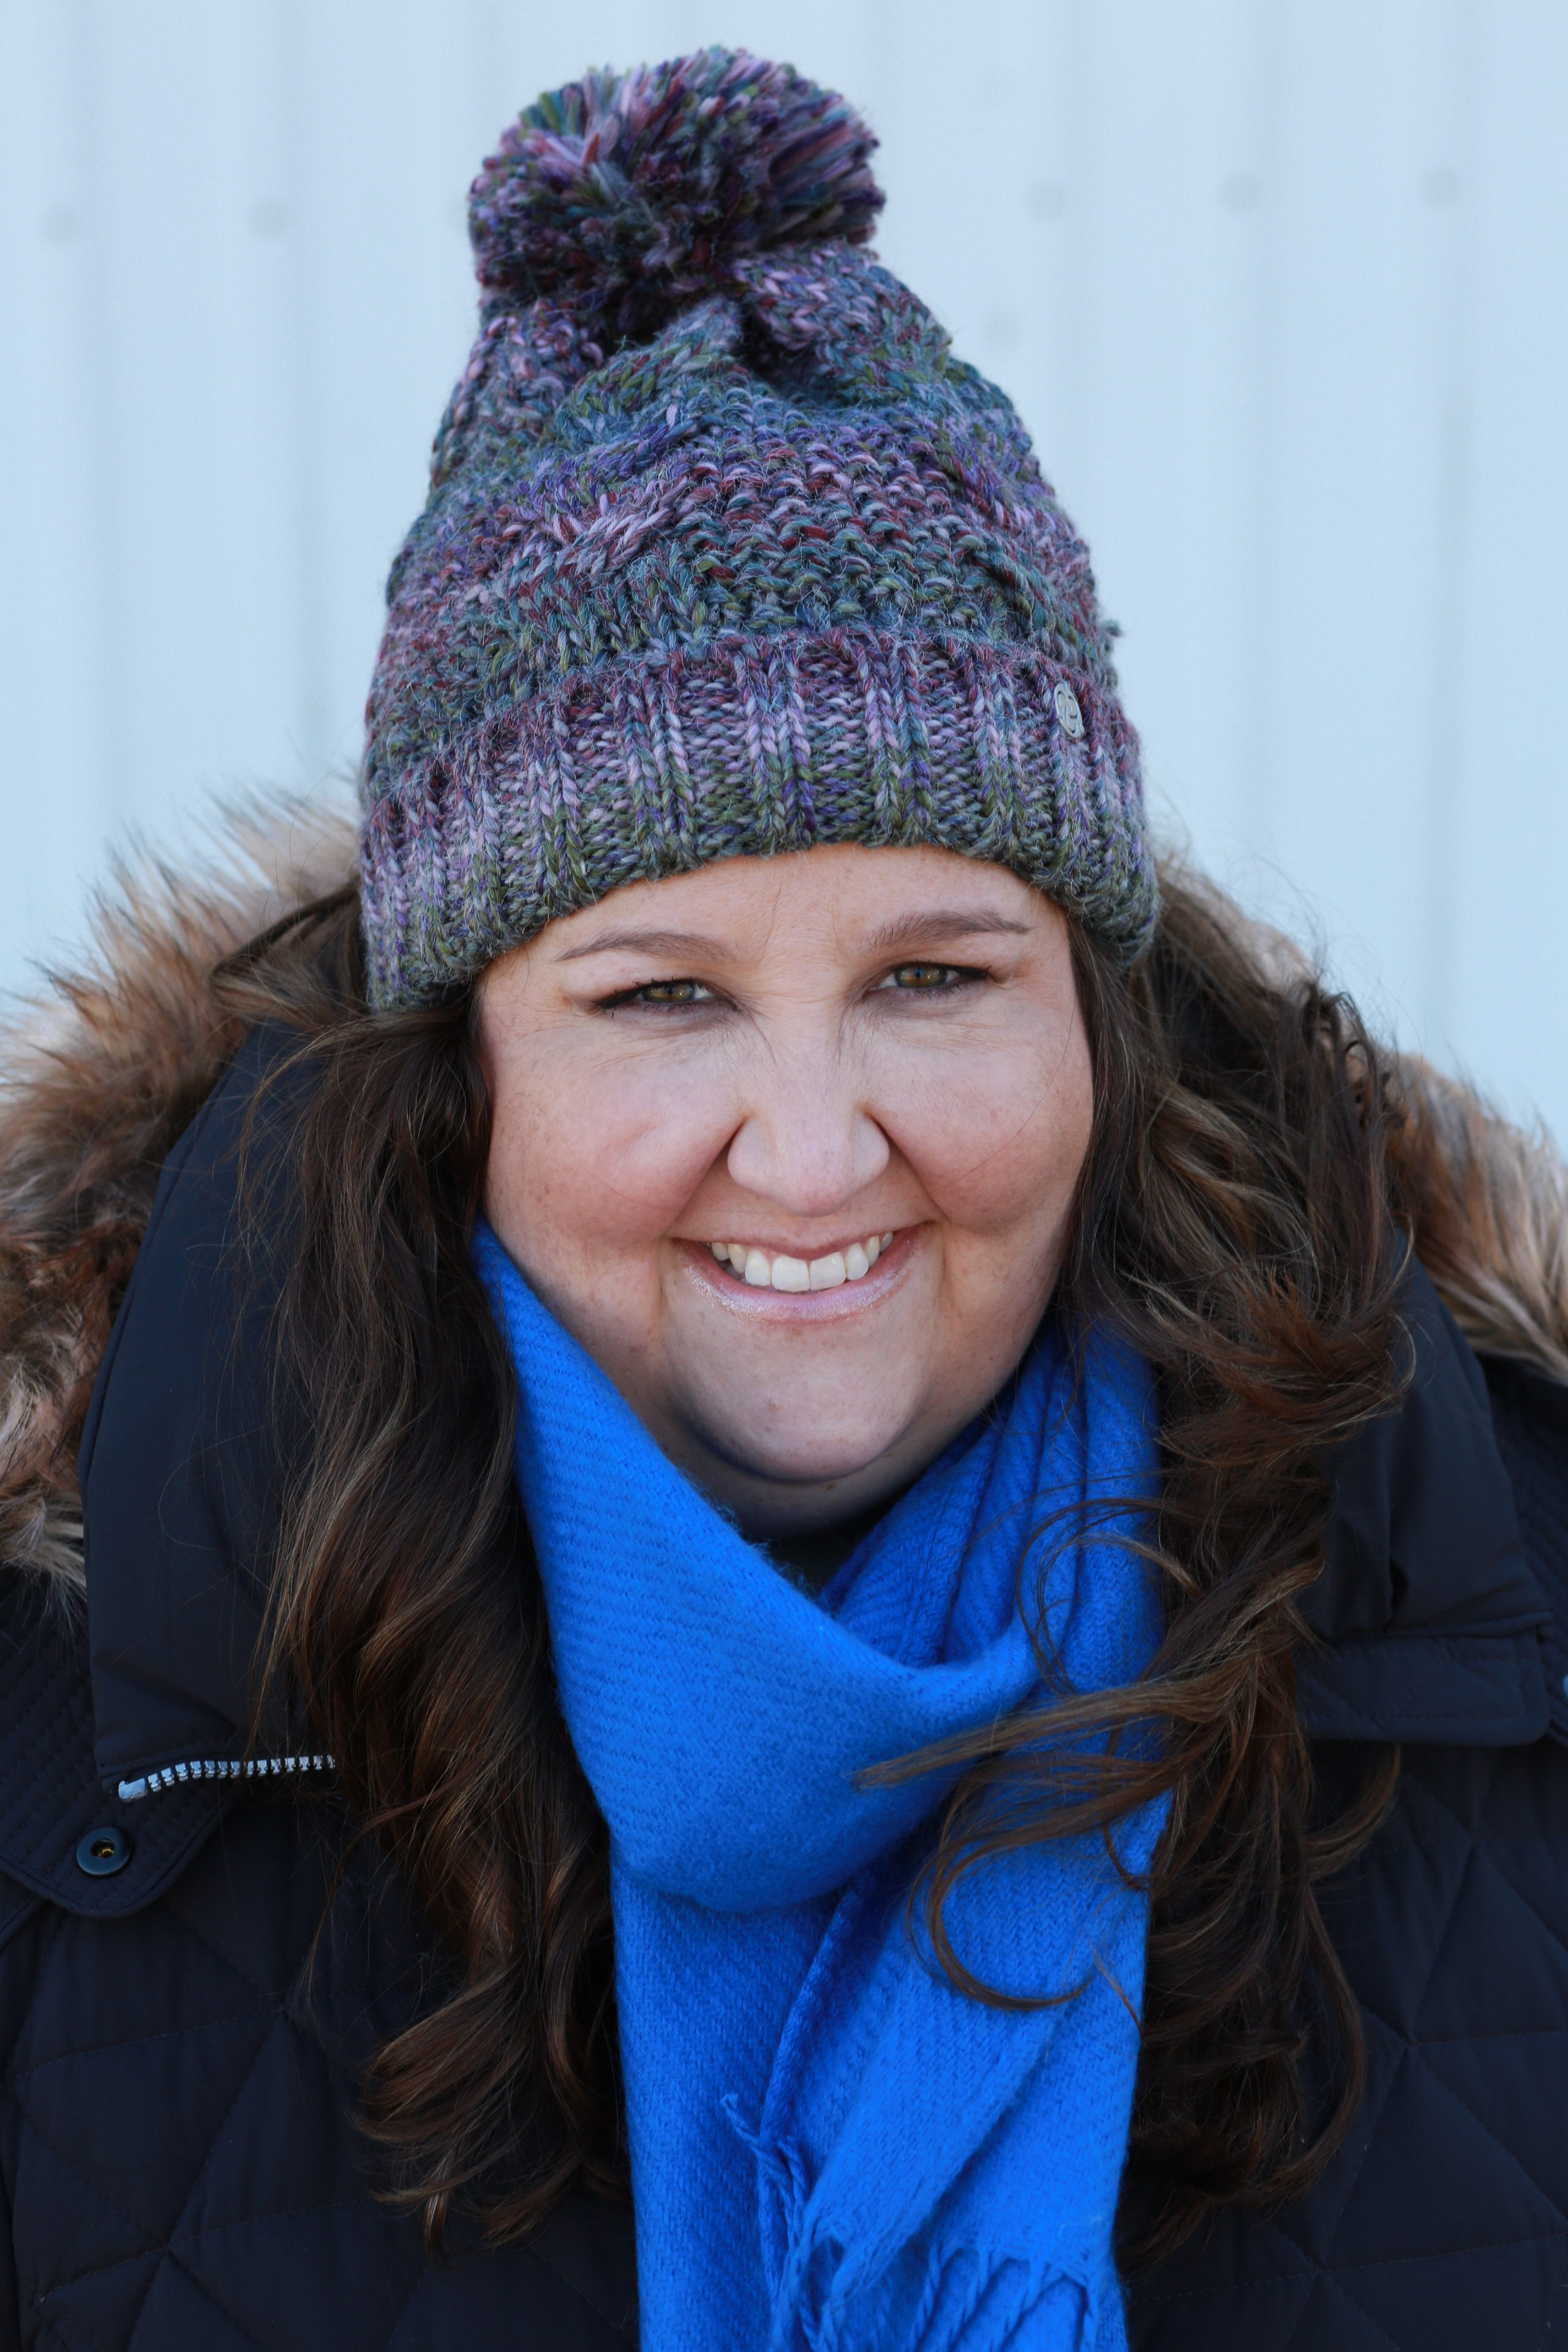 winter accessories, scarf, blue scarf, uggs, beanie, winter, winter style, winter coat, plus size style, plus size coat, #rebekahelizstyle